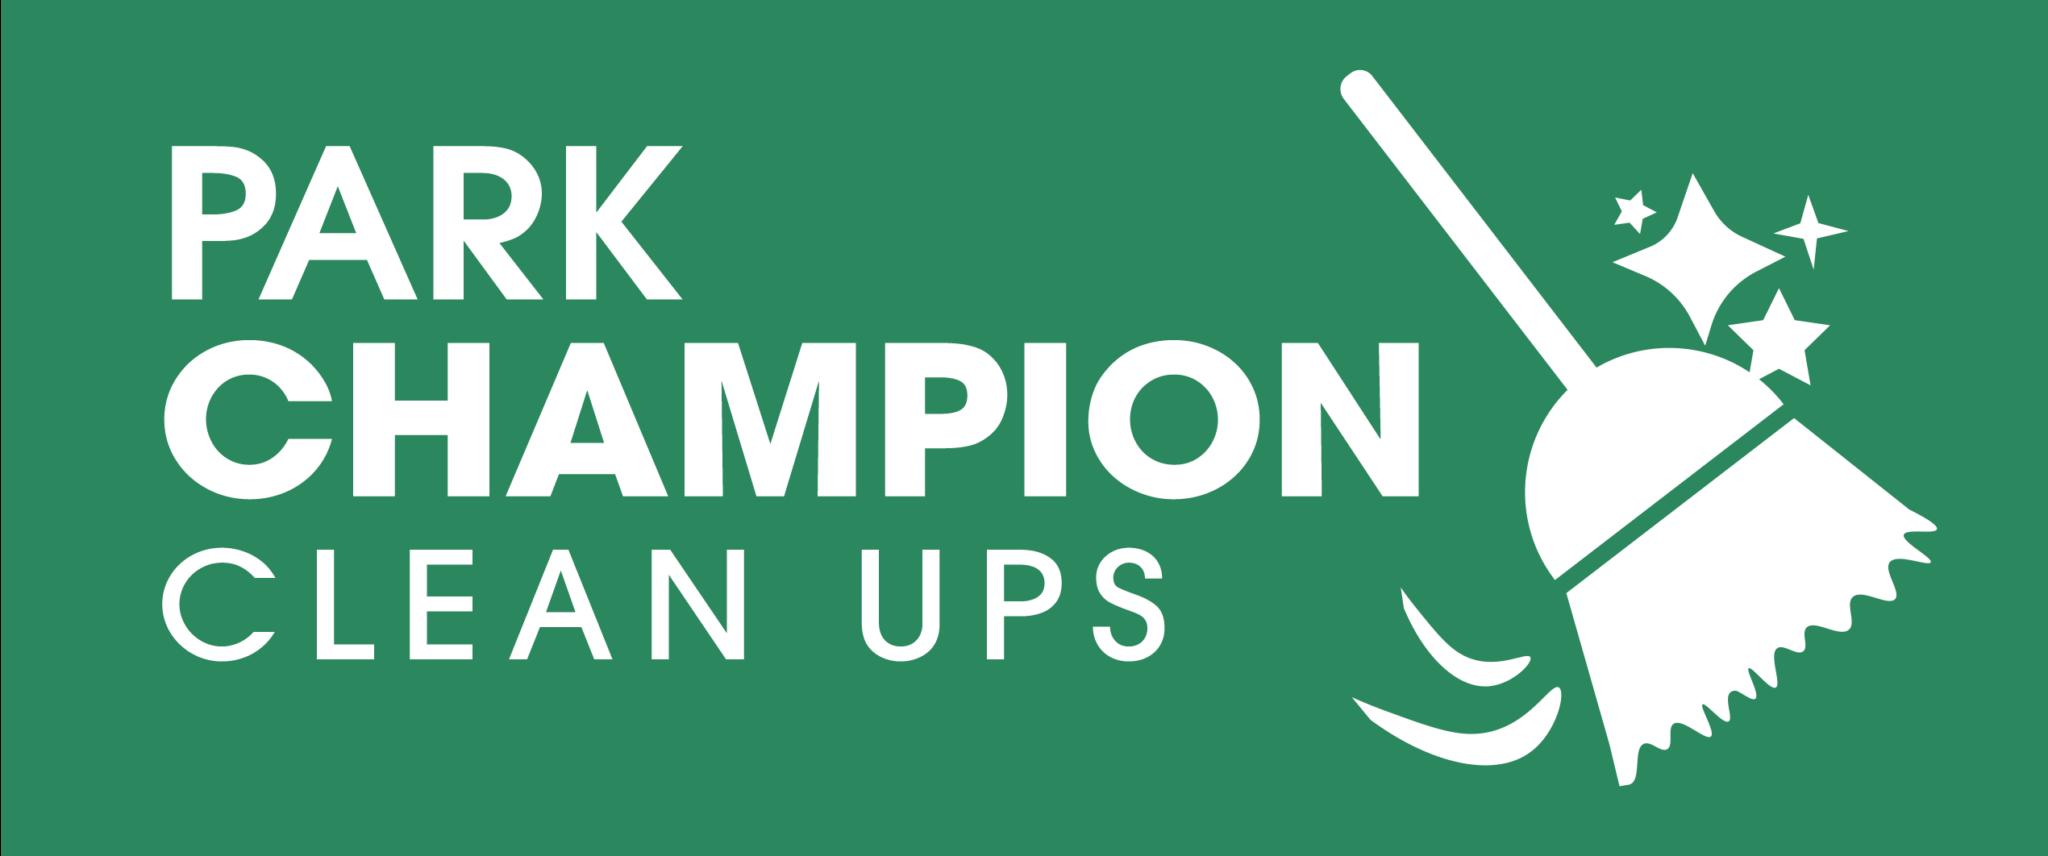 "Banner image stating ""Park Champion Clean Ups"""